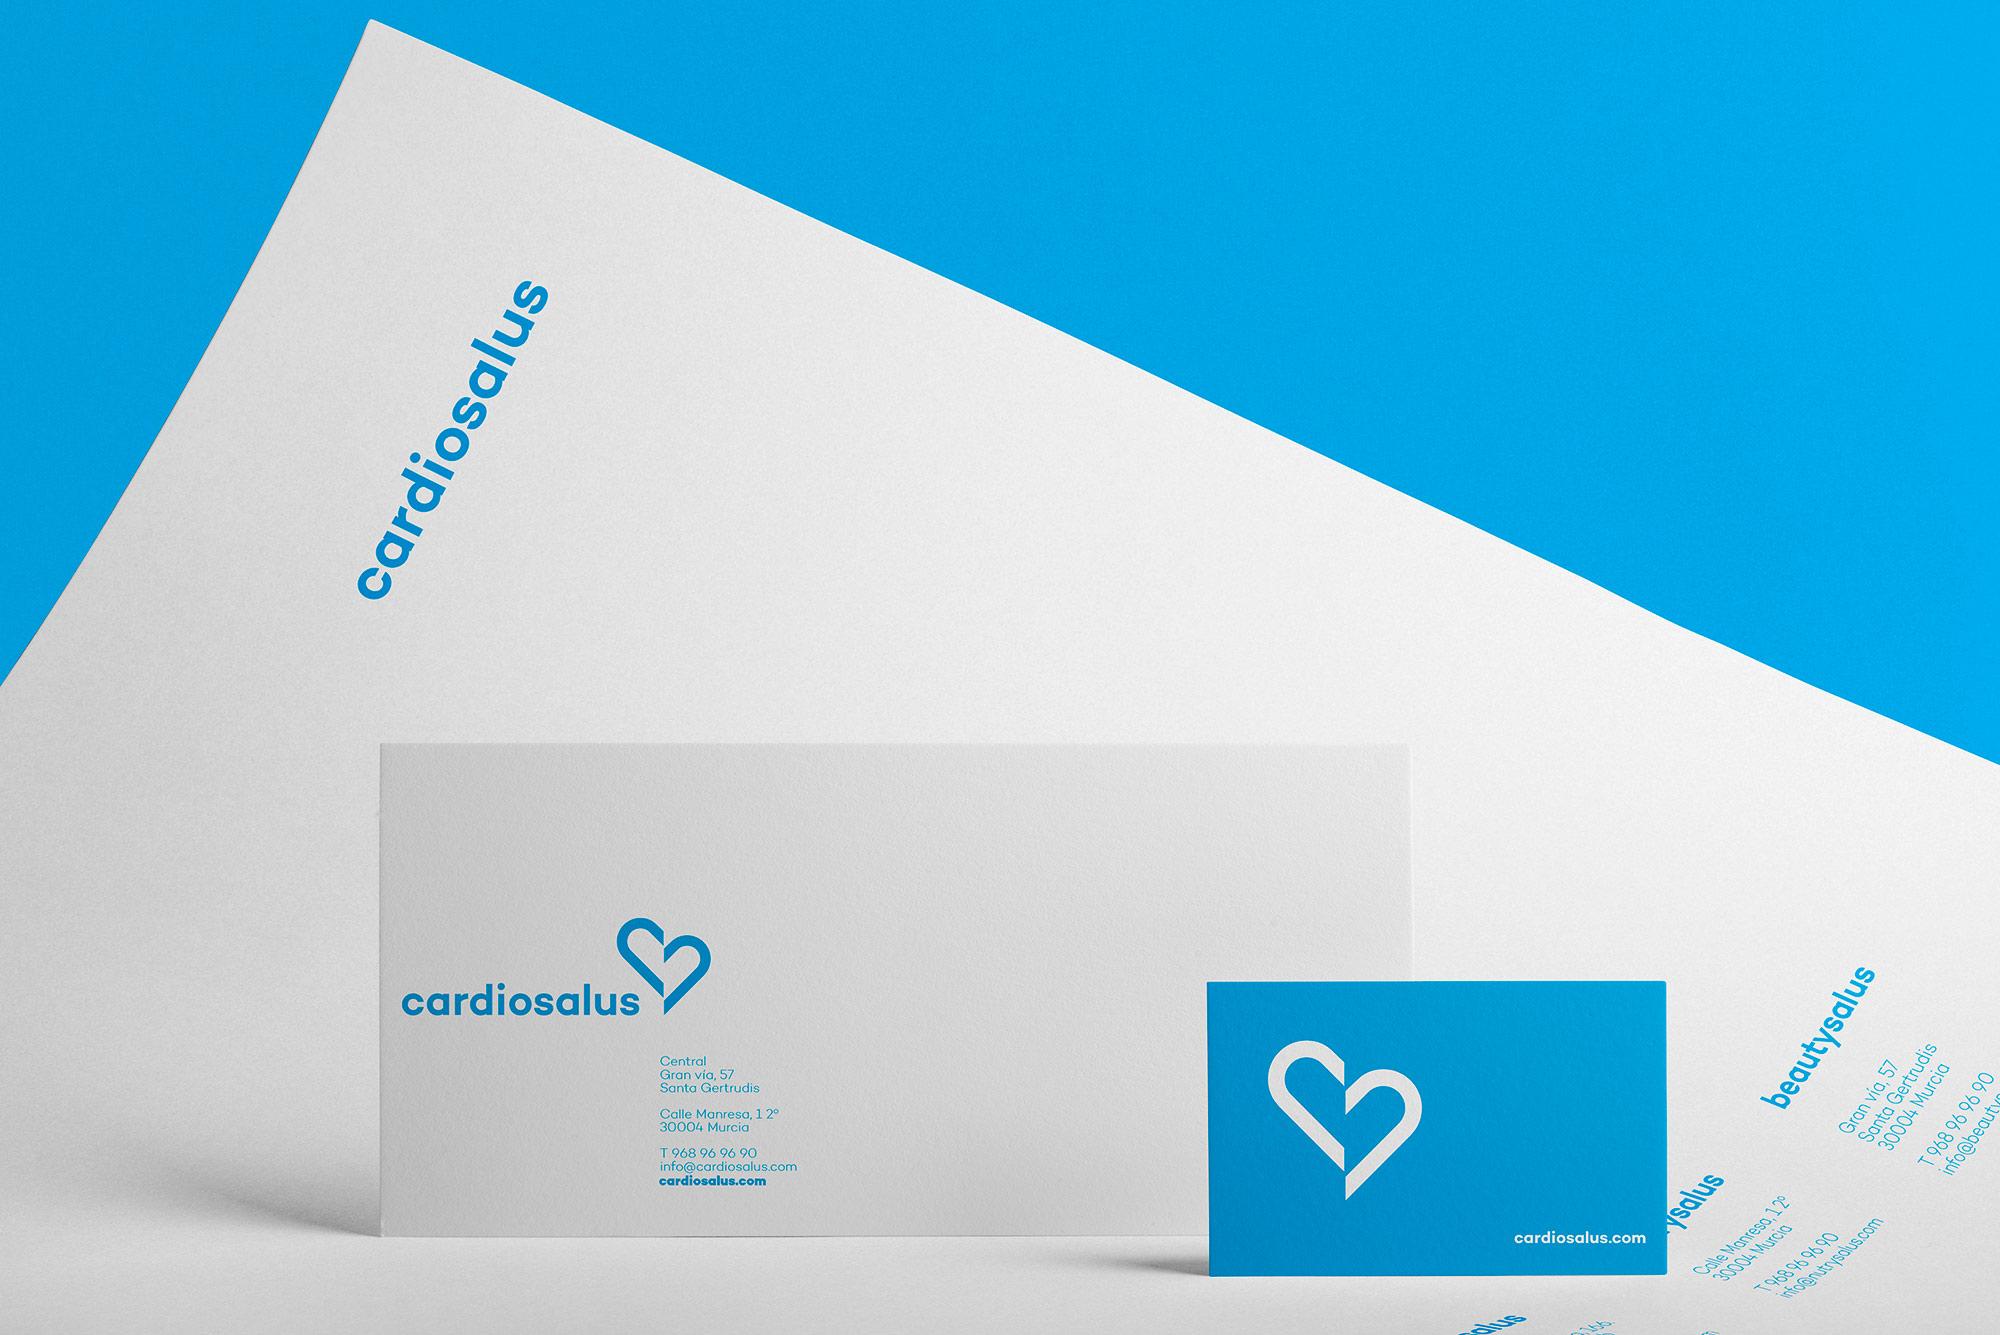 Cardiosalus-branding-05